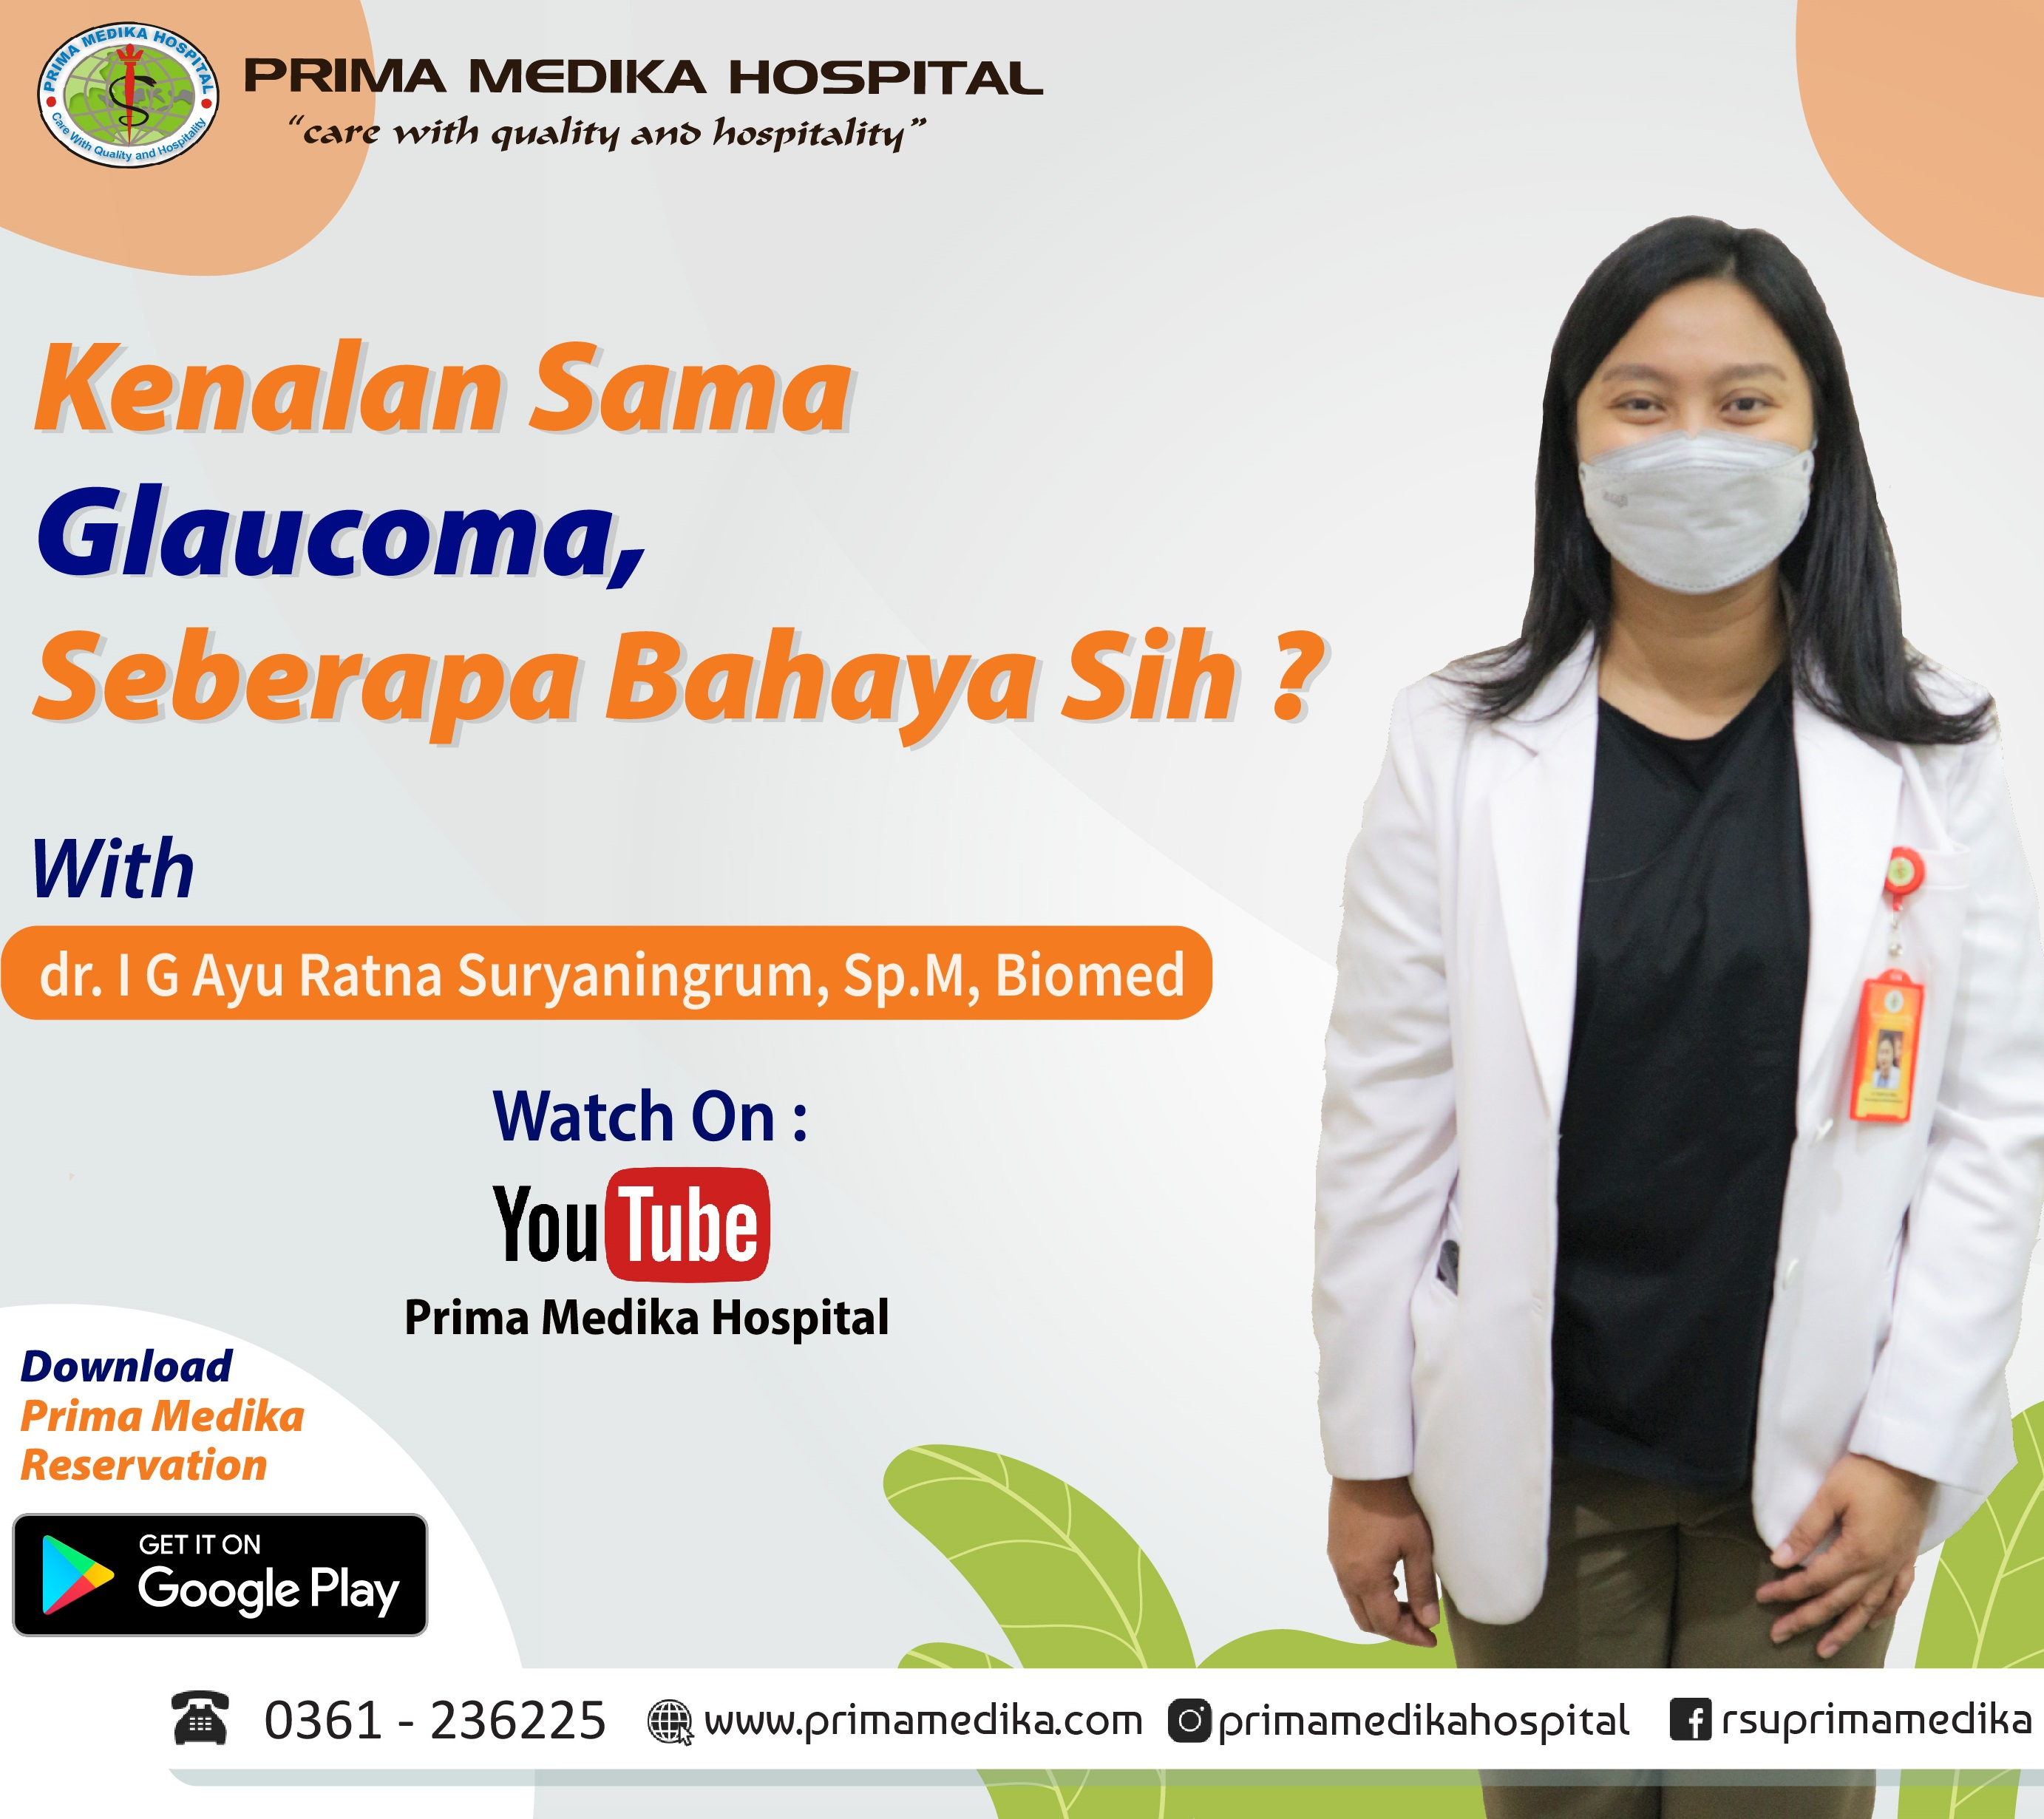 Kenalan Sama Glaucoma, Seberapa Bahaya Sih ?